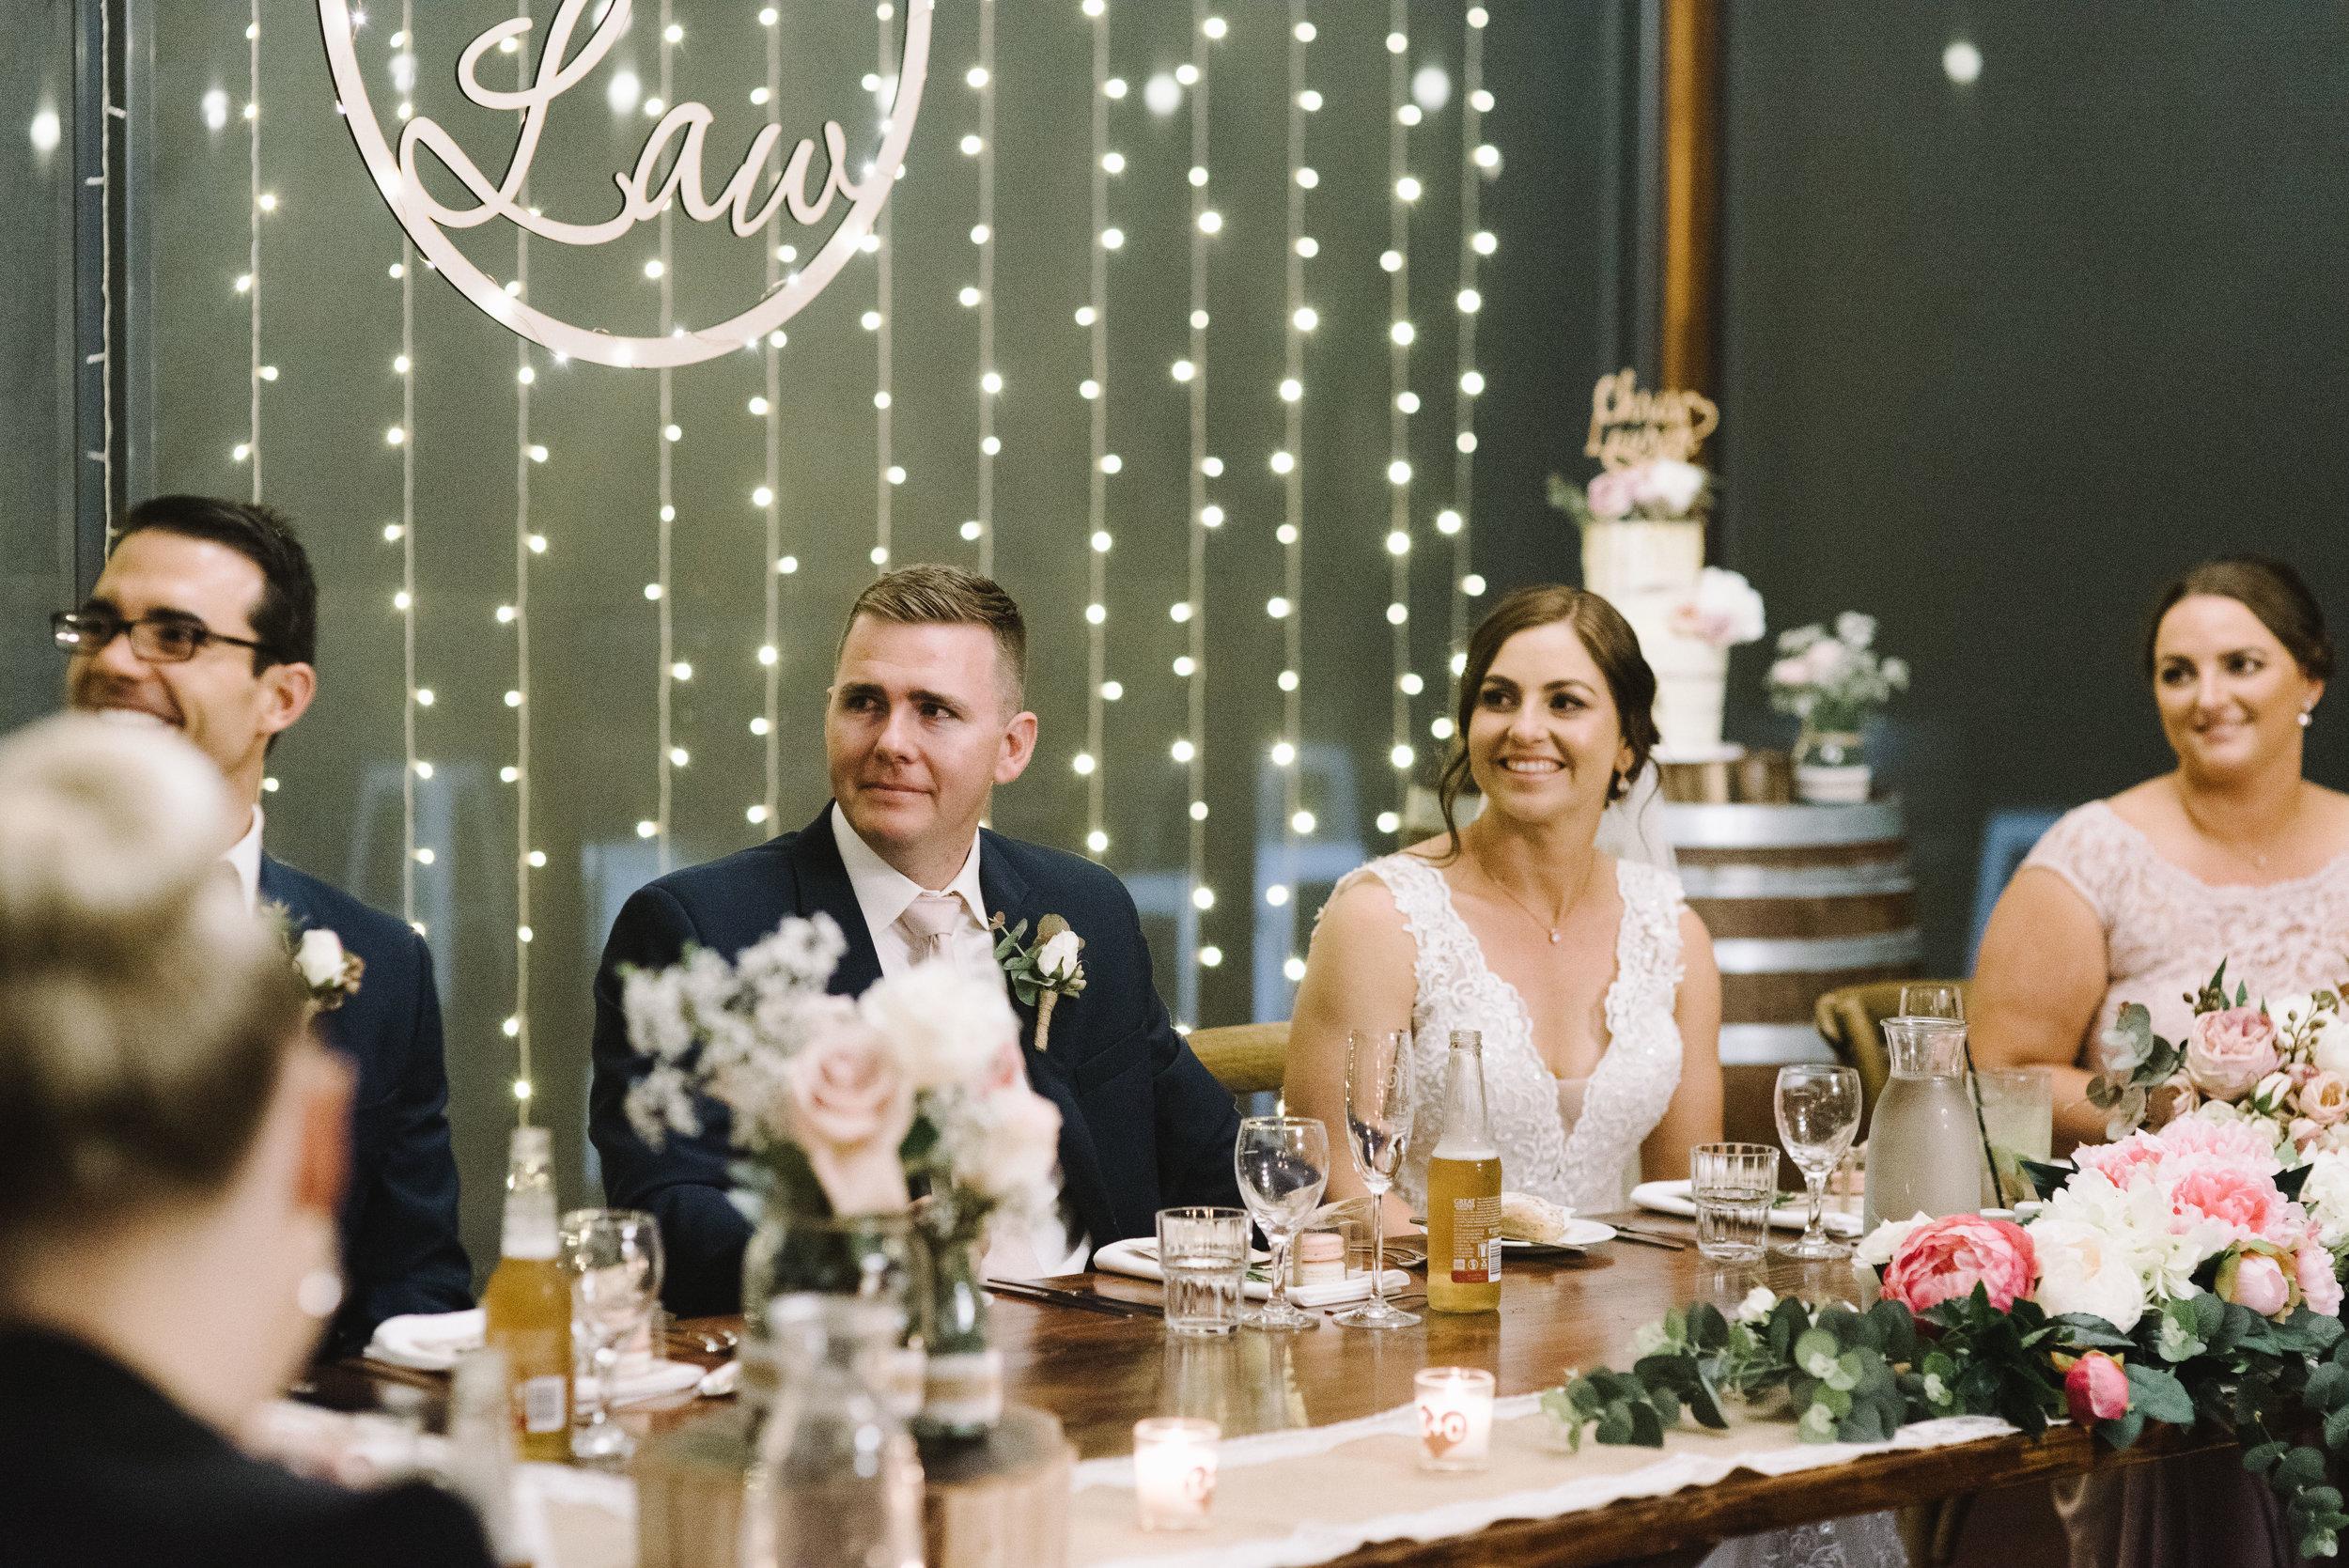 LAURENOLIVIA-austinvilla-estate-wedding-81.jpg